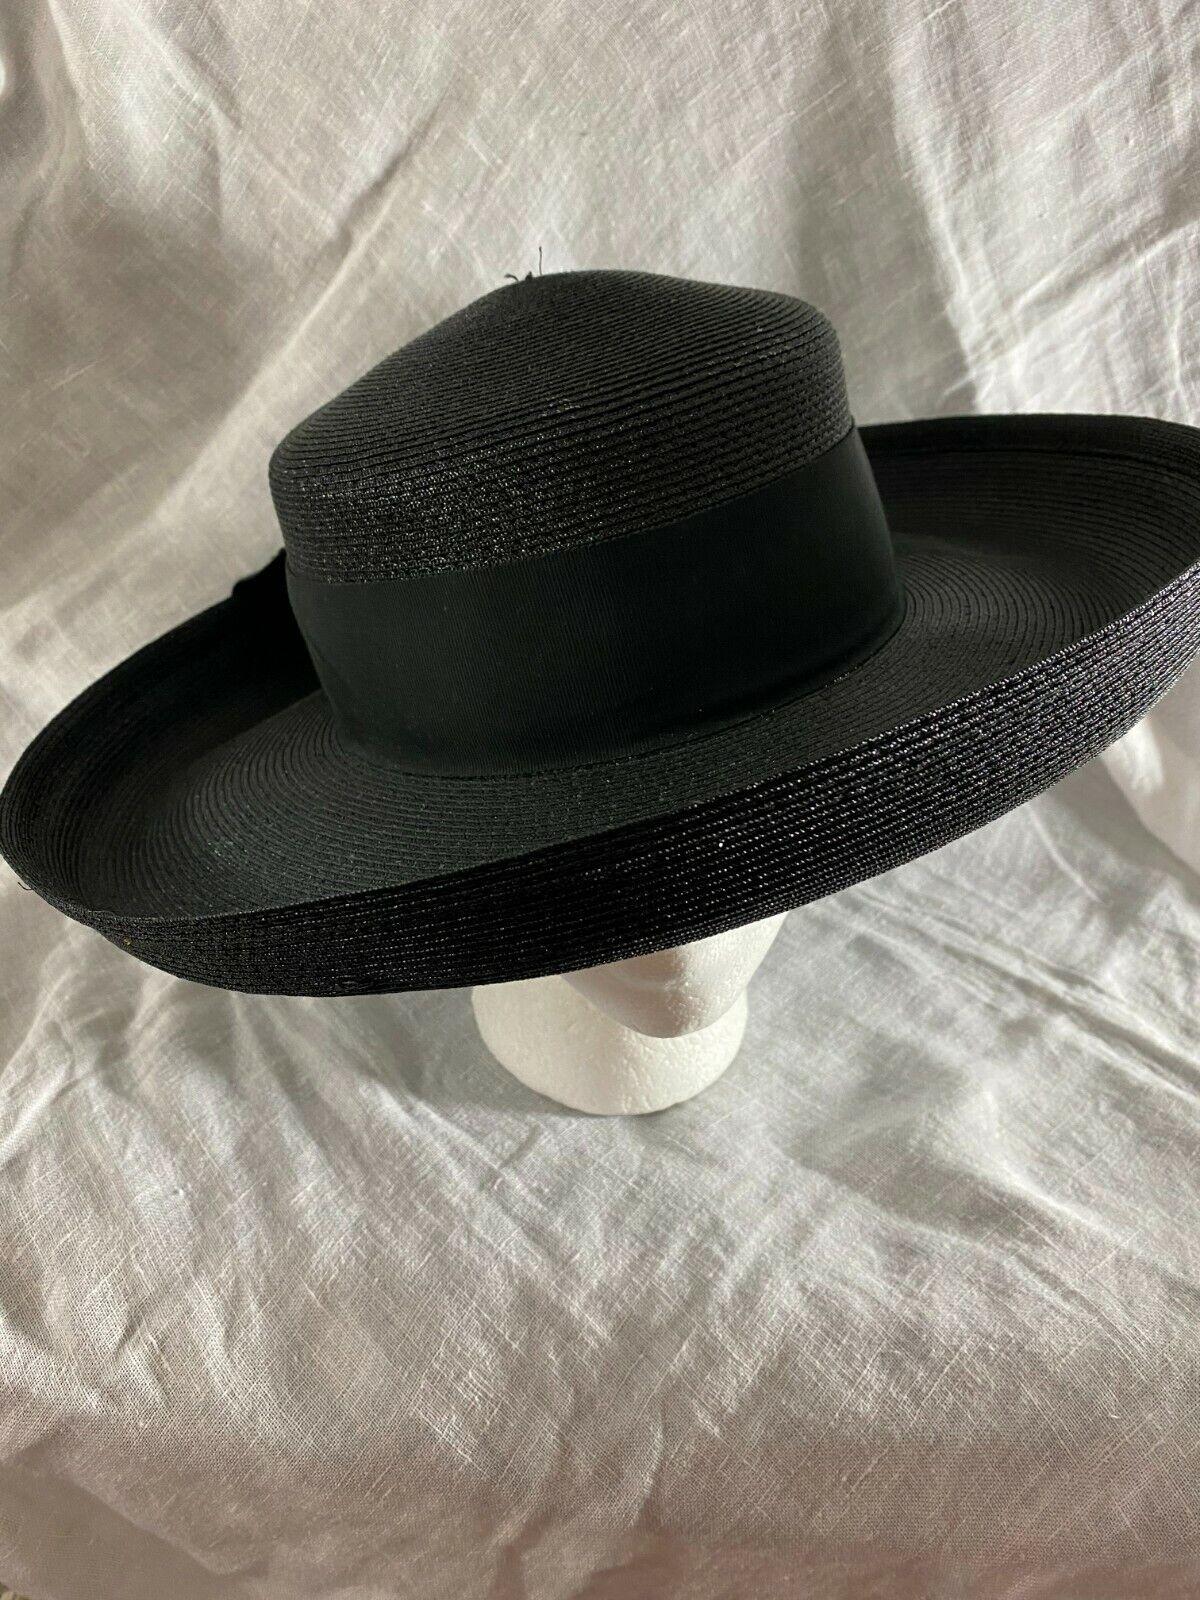 1940's HAT -Wide Brim- Black Straw w/Black Ribbon… - image 1